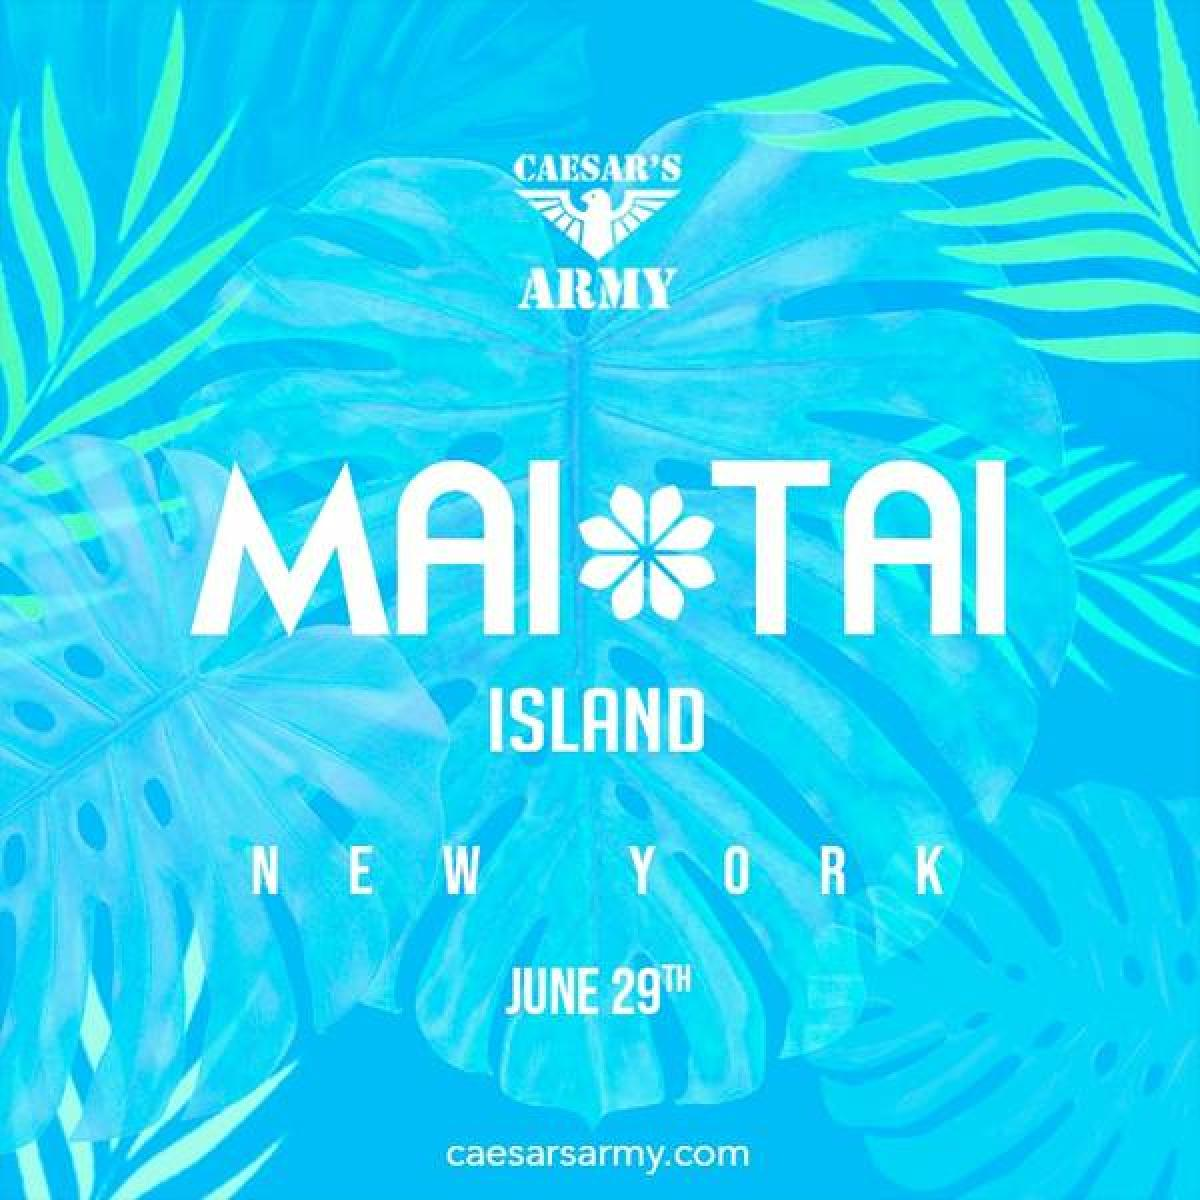 Mai Tai Island New York flyer or graphic.